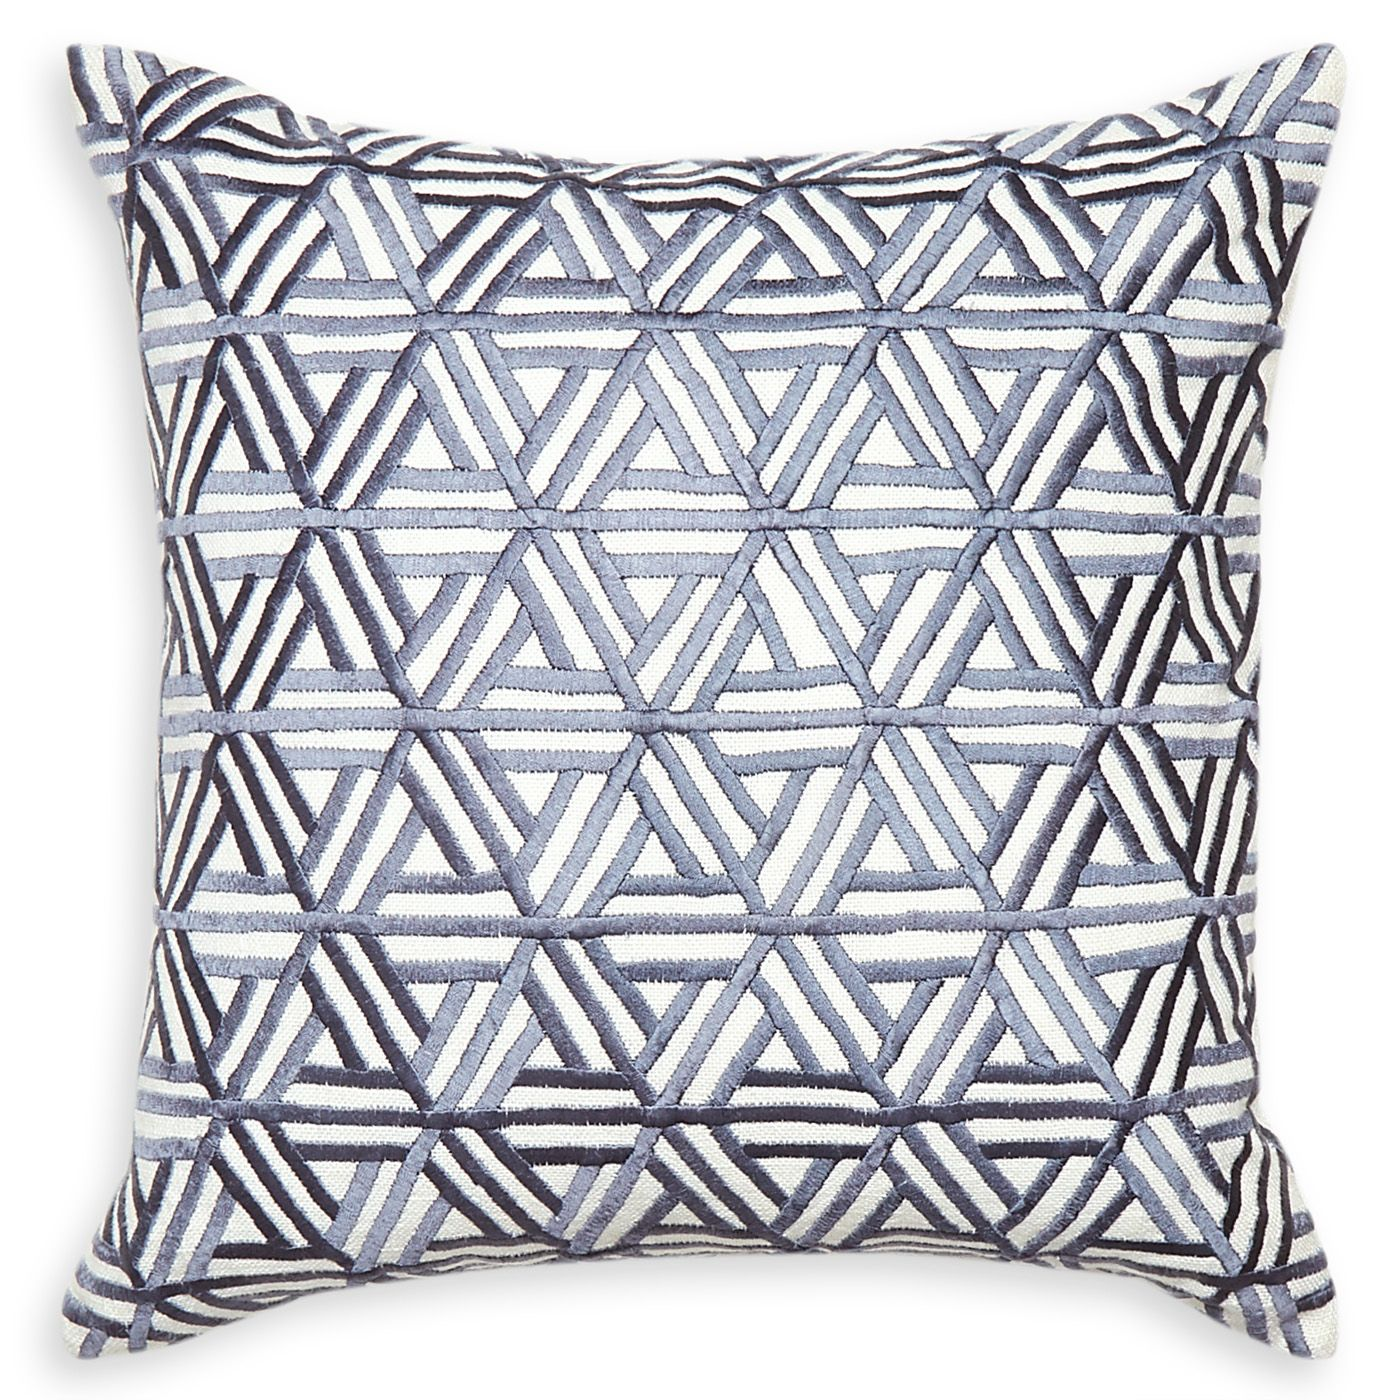 Stella Web Pillow Modern Home Decor Luxury Gifts Mid Century Modern Furniture Dekorativnye Podushki Podushki